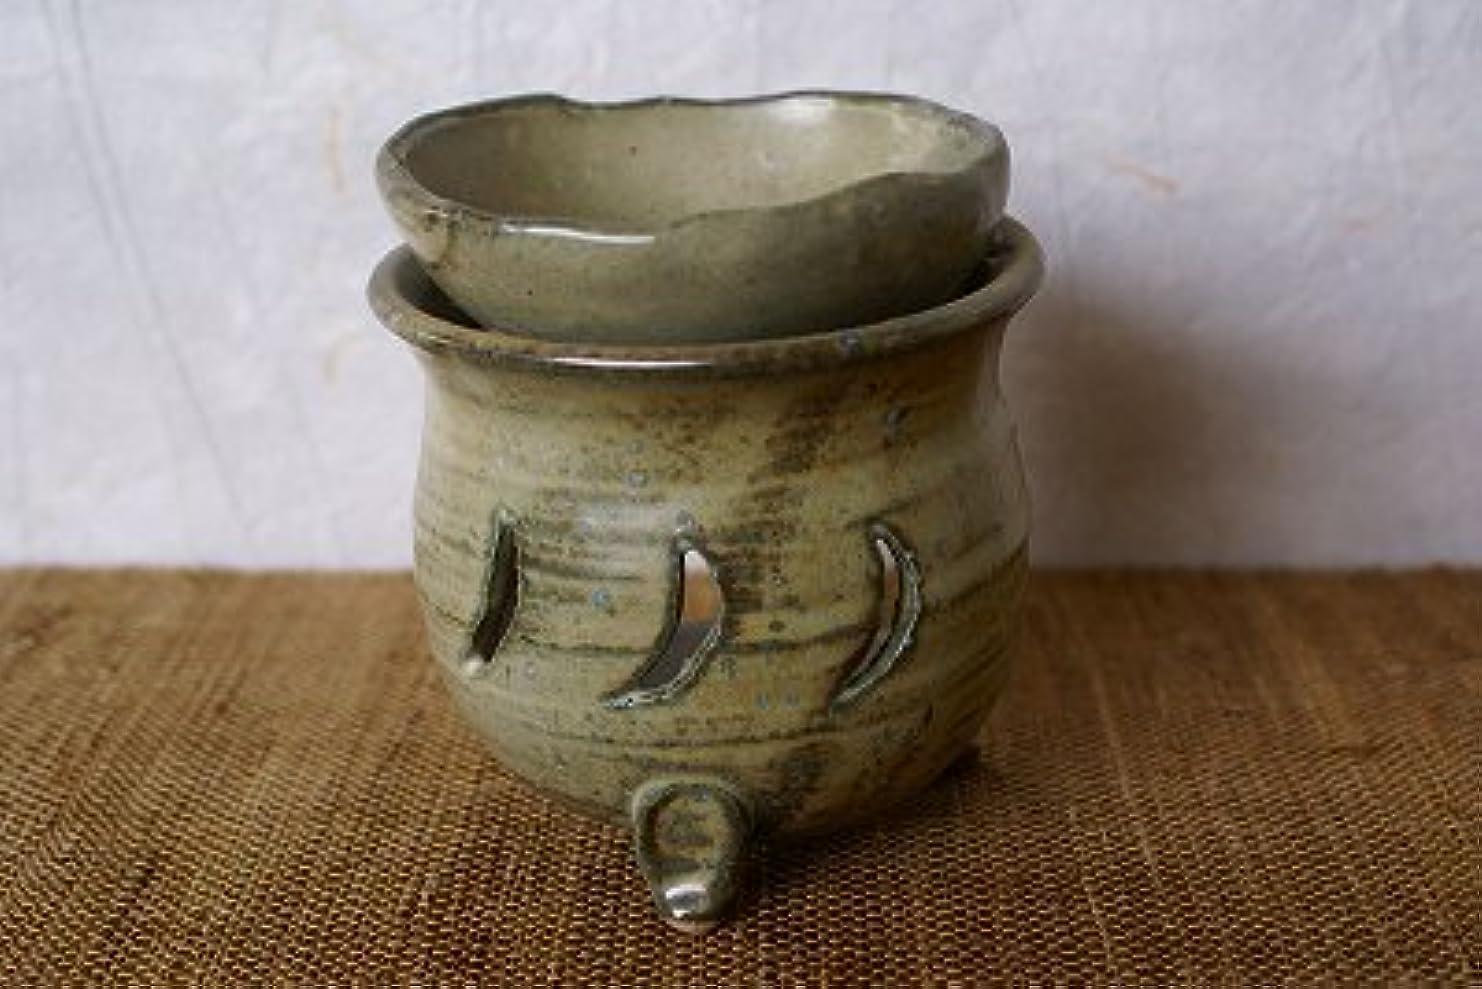 期限正確範囲信楽焼 茶香炉 月 サイズ:約直径9.5×10cm